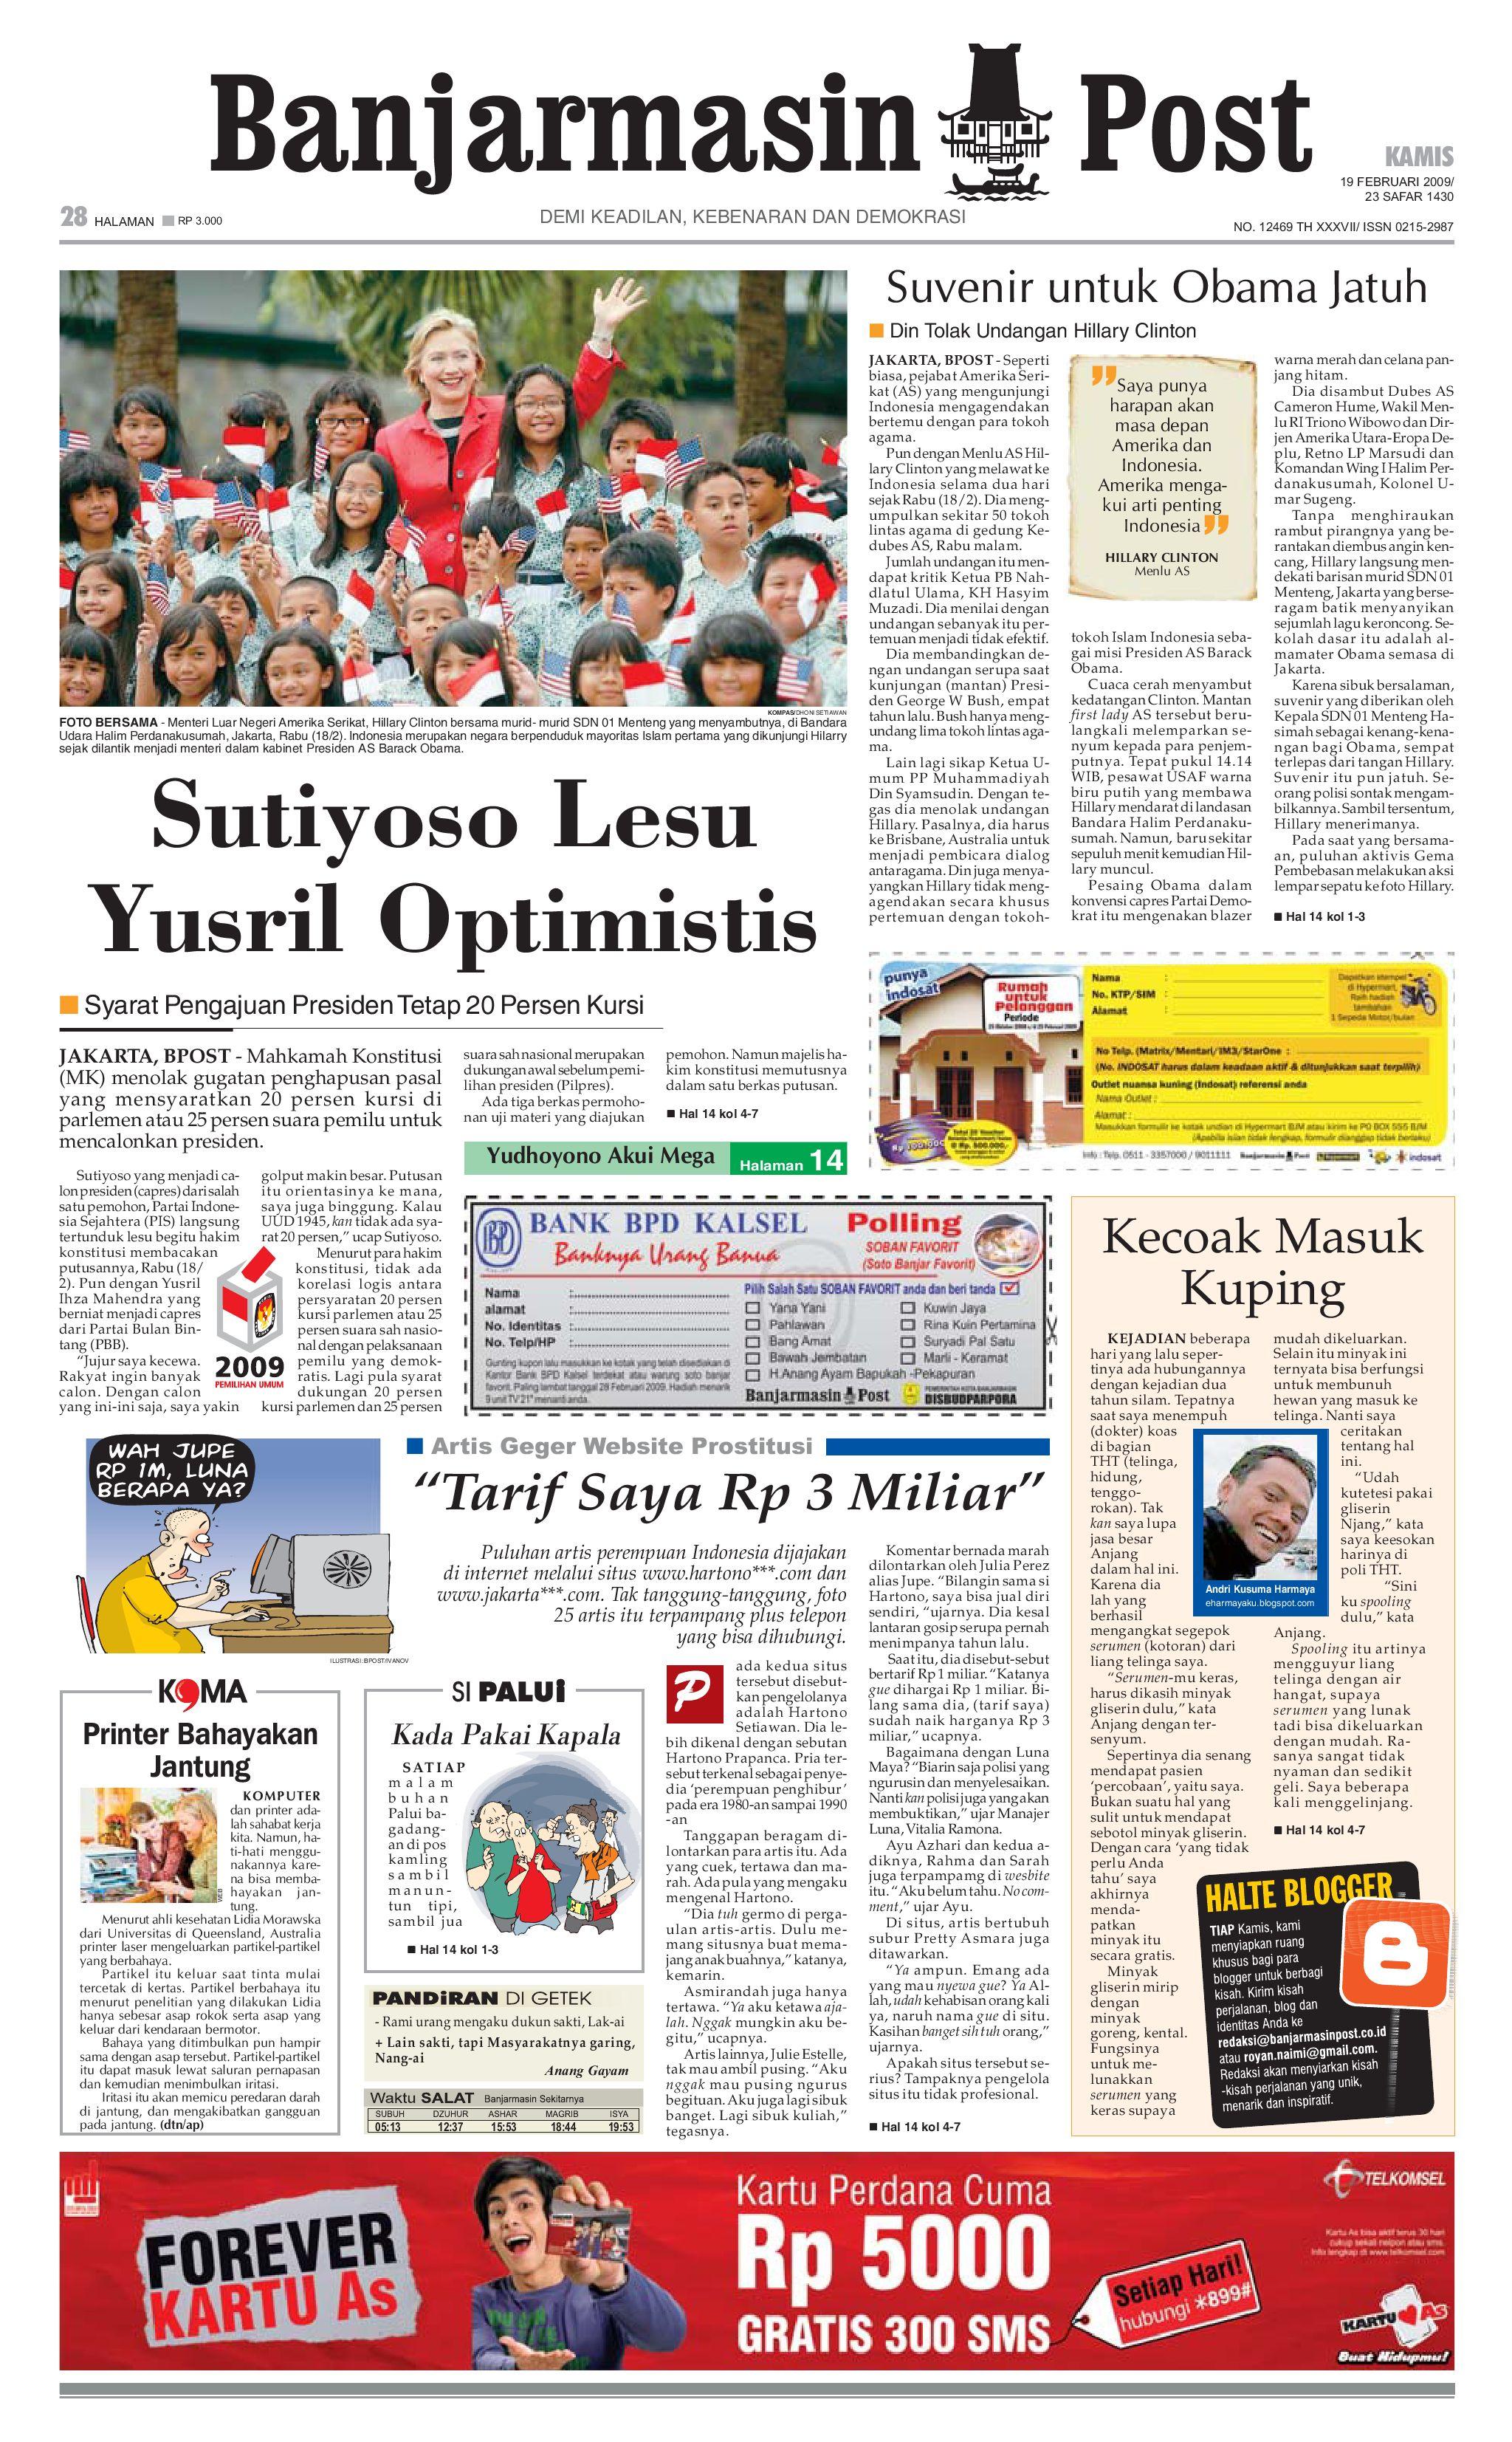 tribunkaltim 15 november 2009 by tohir tribun issuu